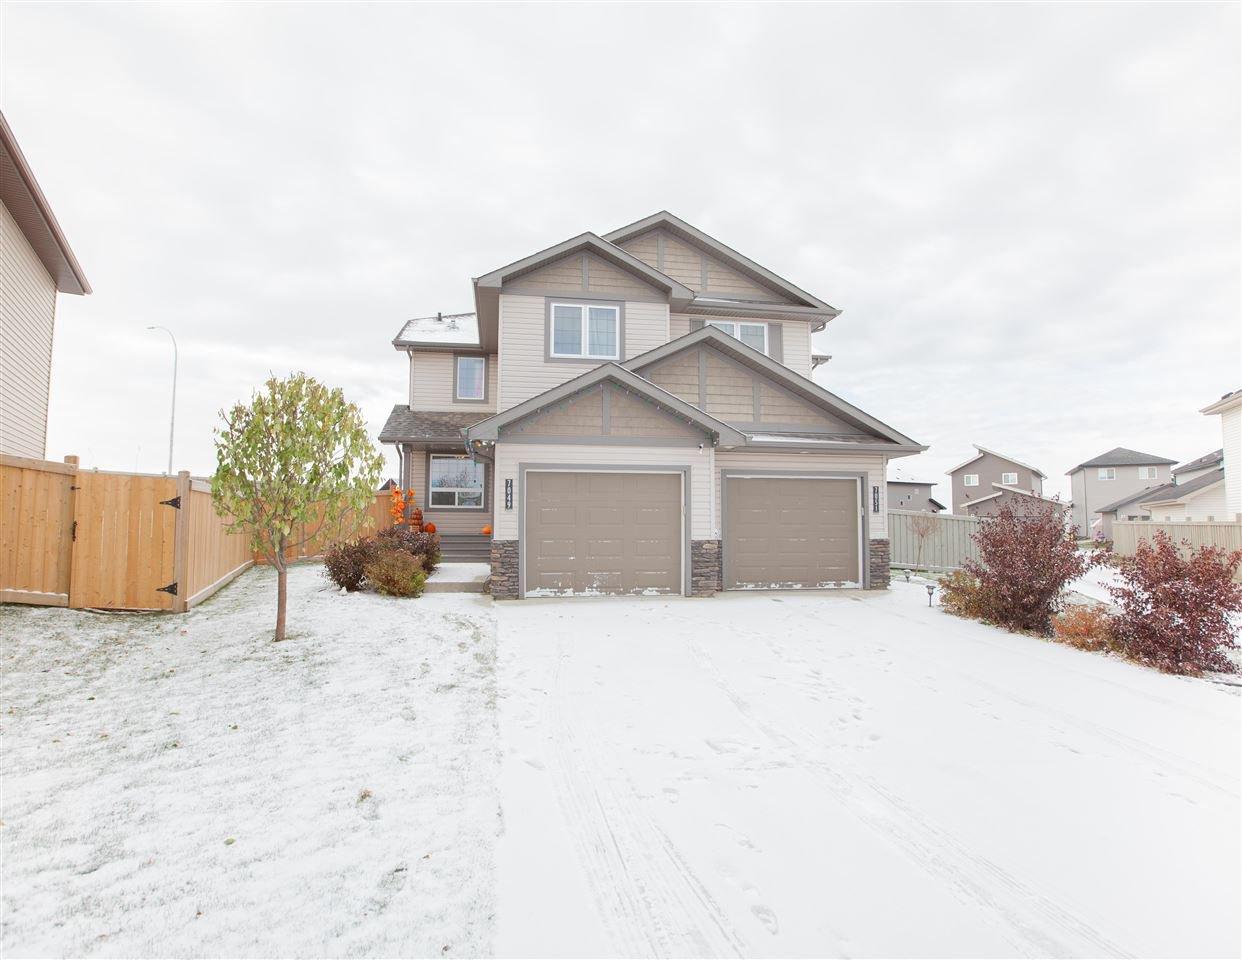 Main Photo: 7049 CARDINAL Way in Edmonton: Zone 55 House Half Duplex for sale : MLS®# E4218673